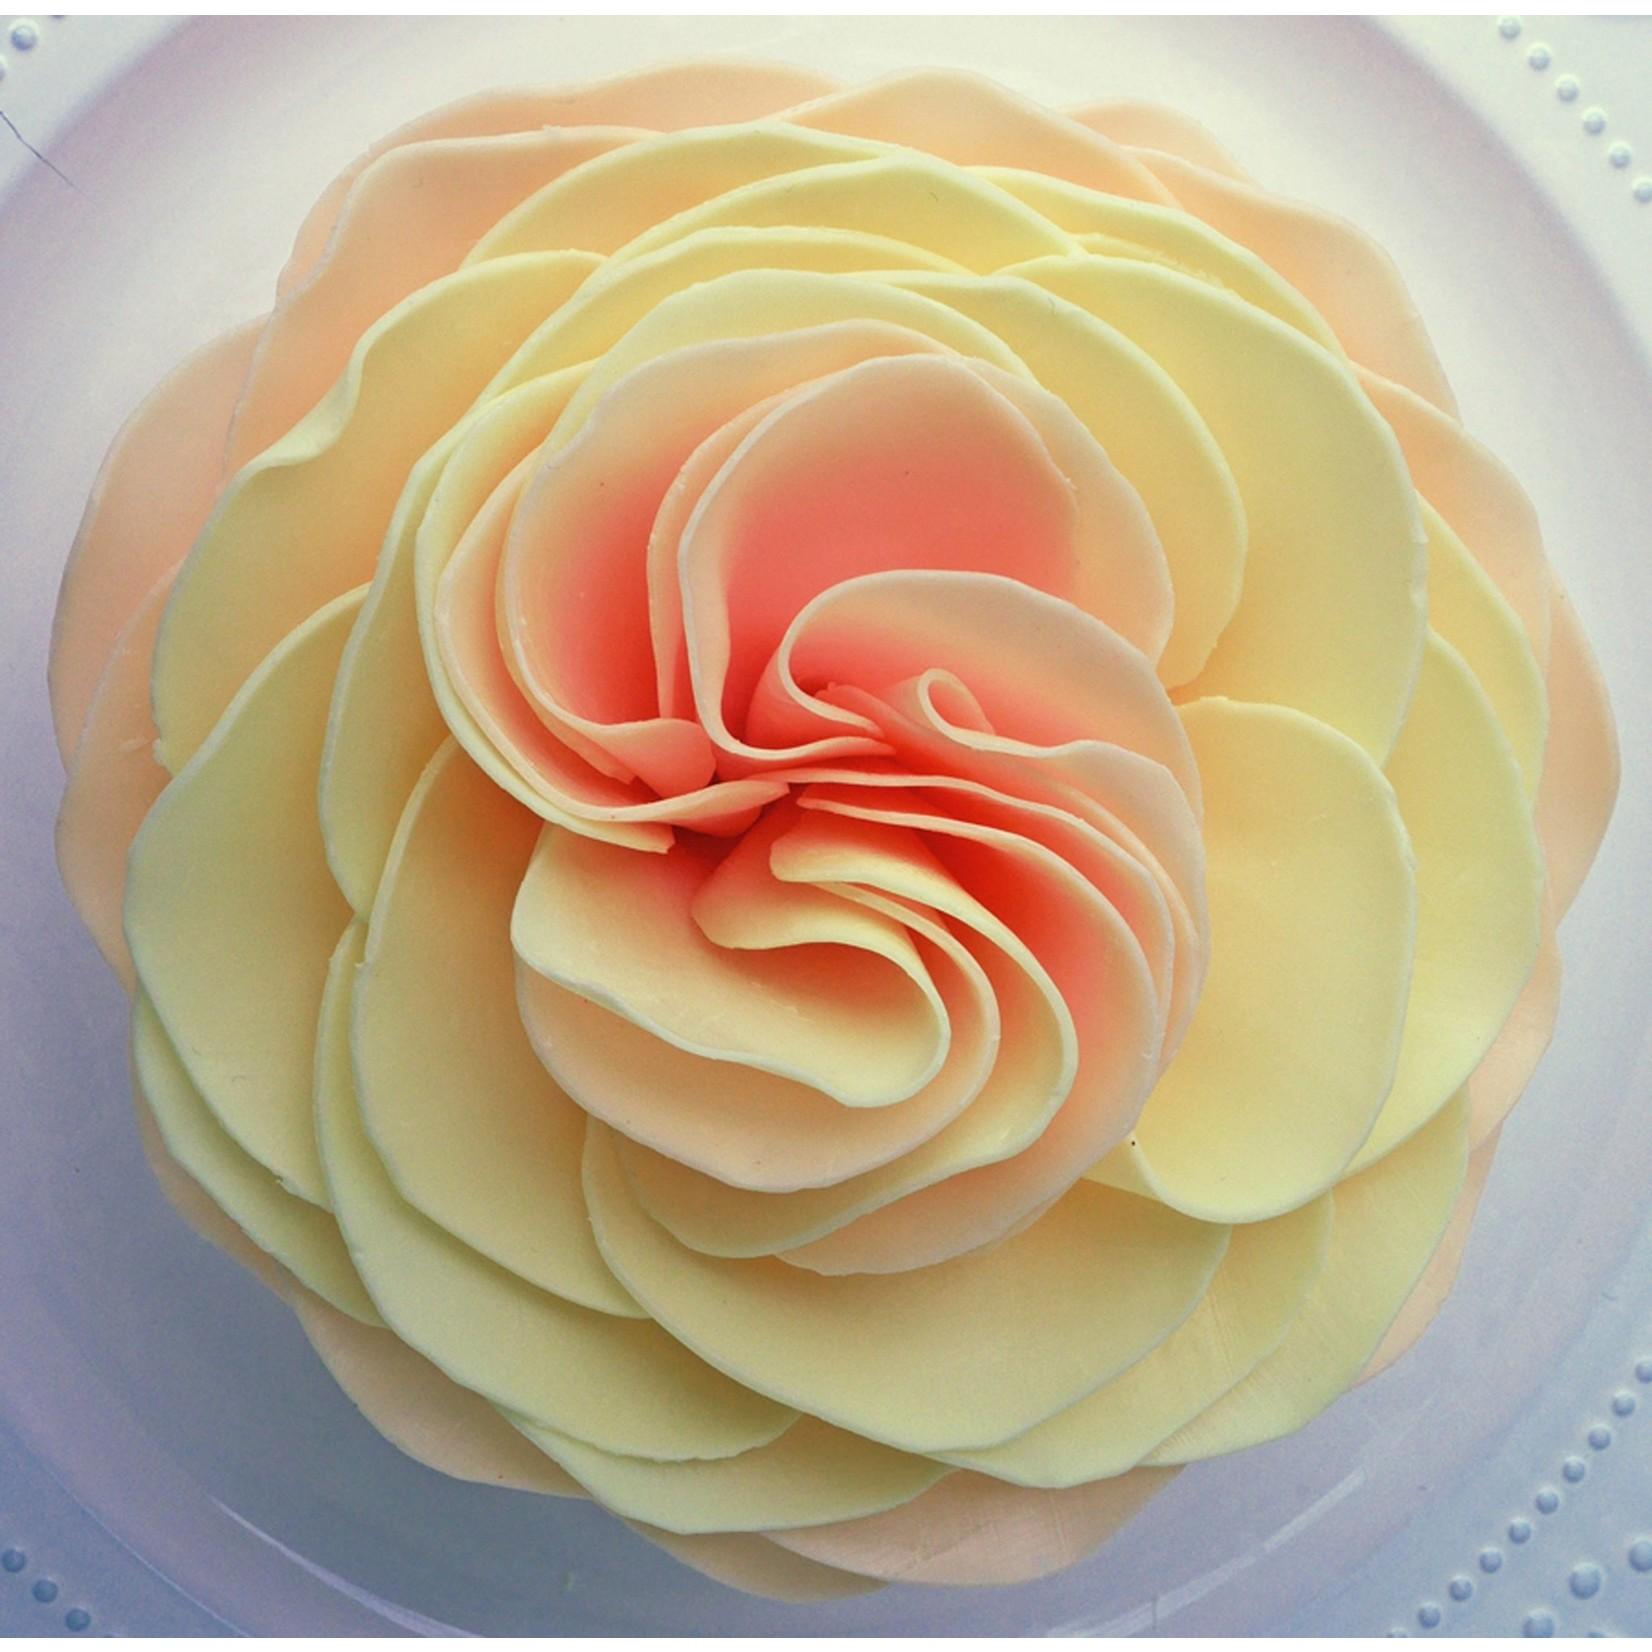 A'marie's Bath Flower Shop Juliet's Dream Bathing Petal Soap Flower